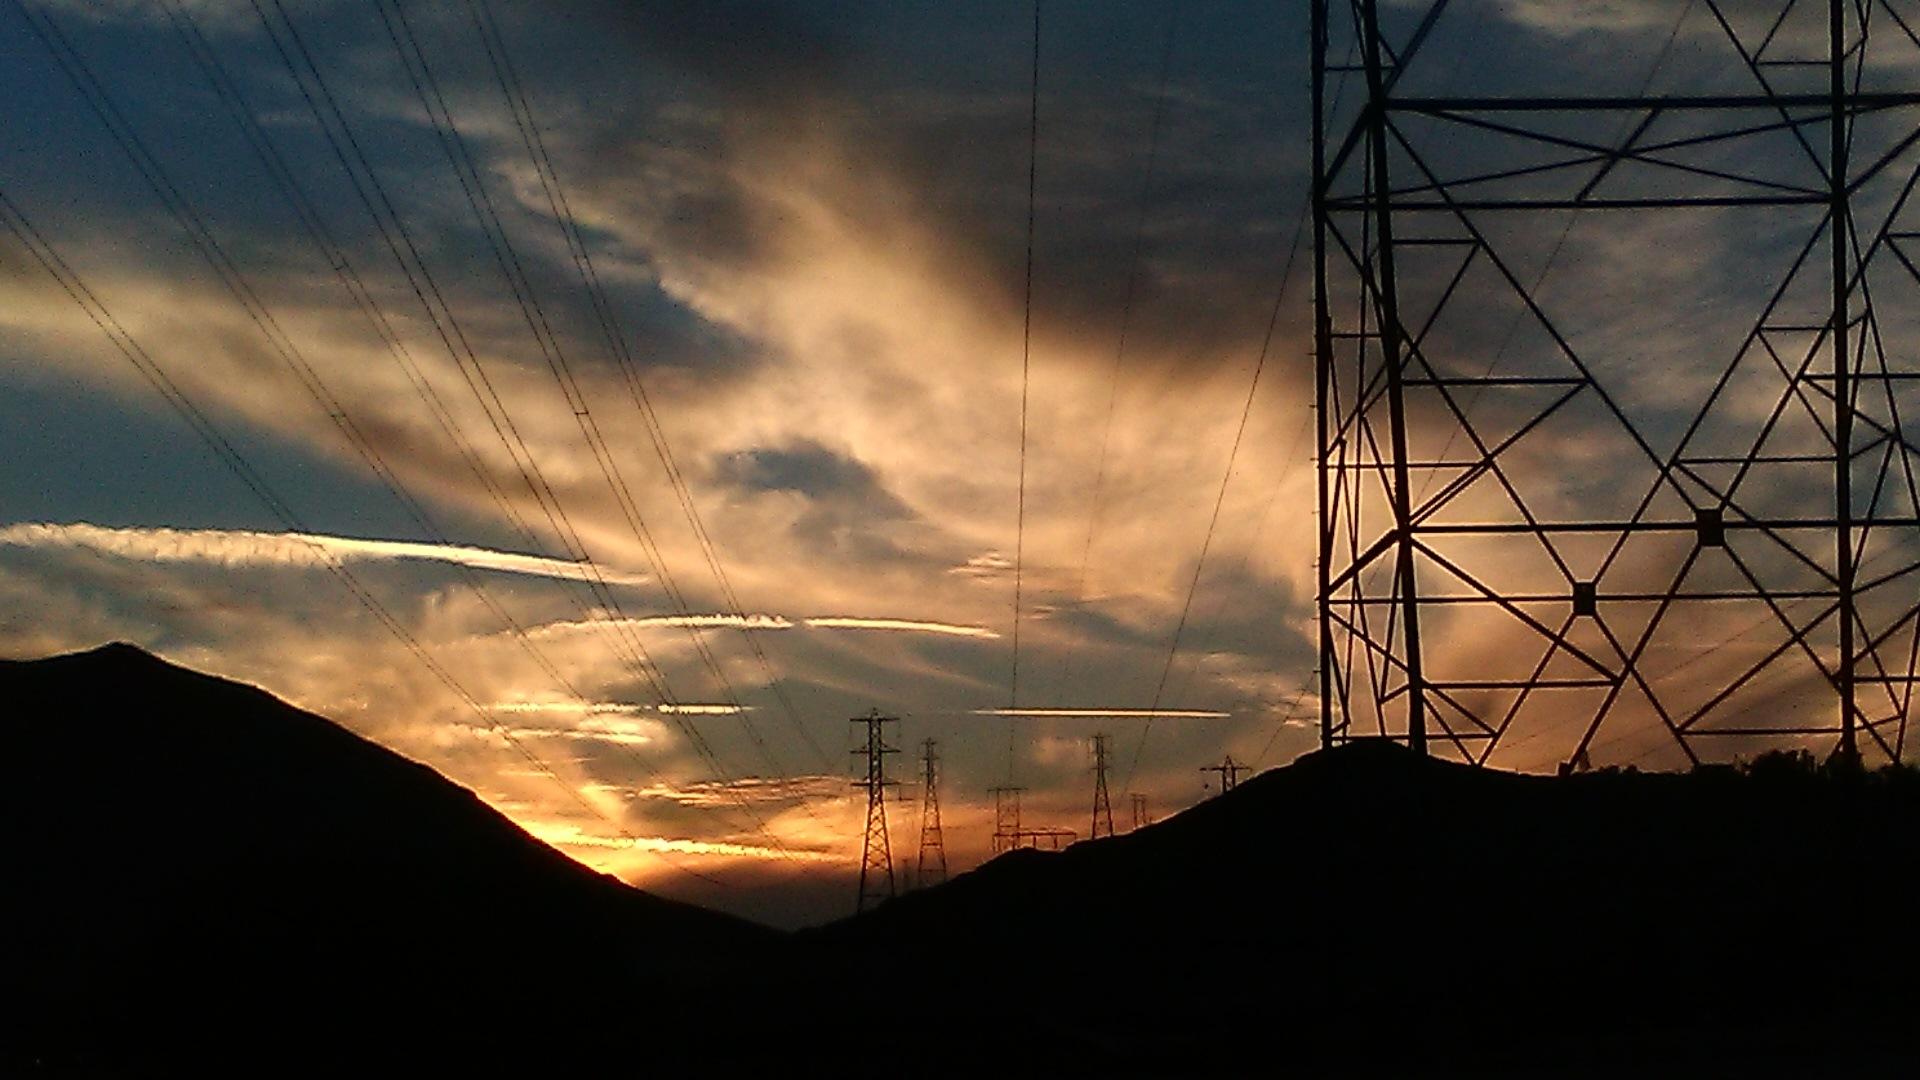 Sunset in Cali by Keri E. Carter